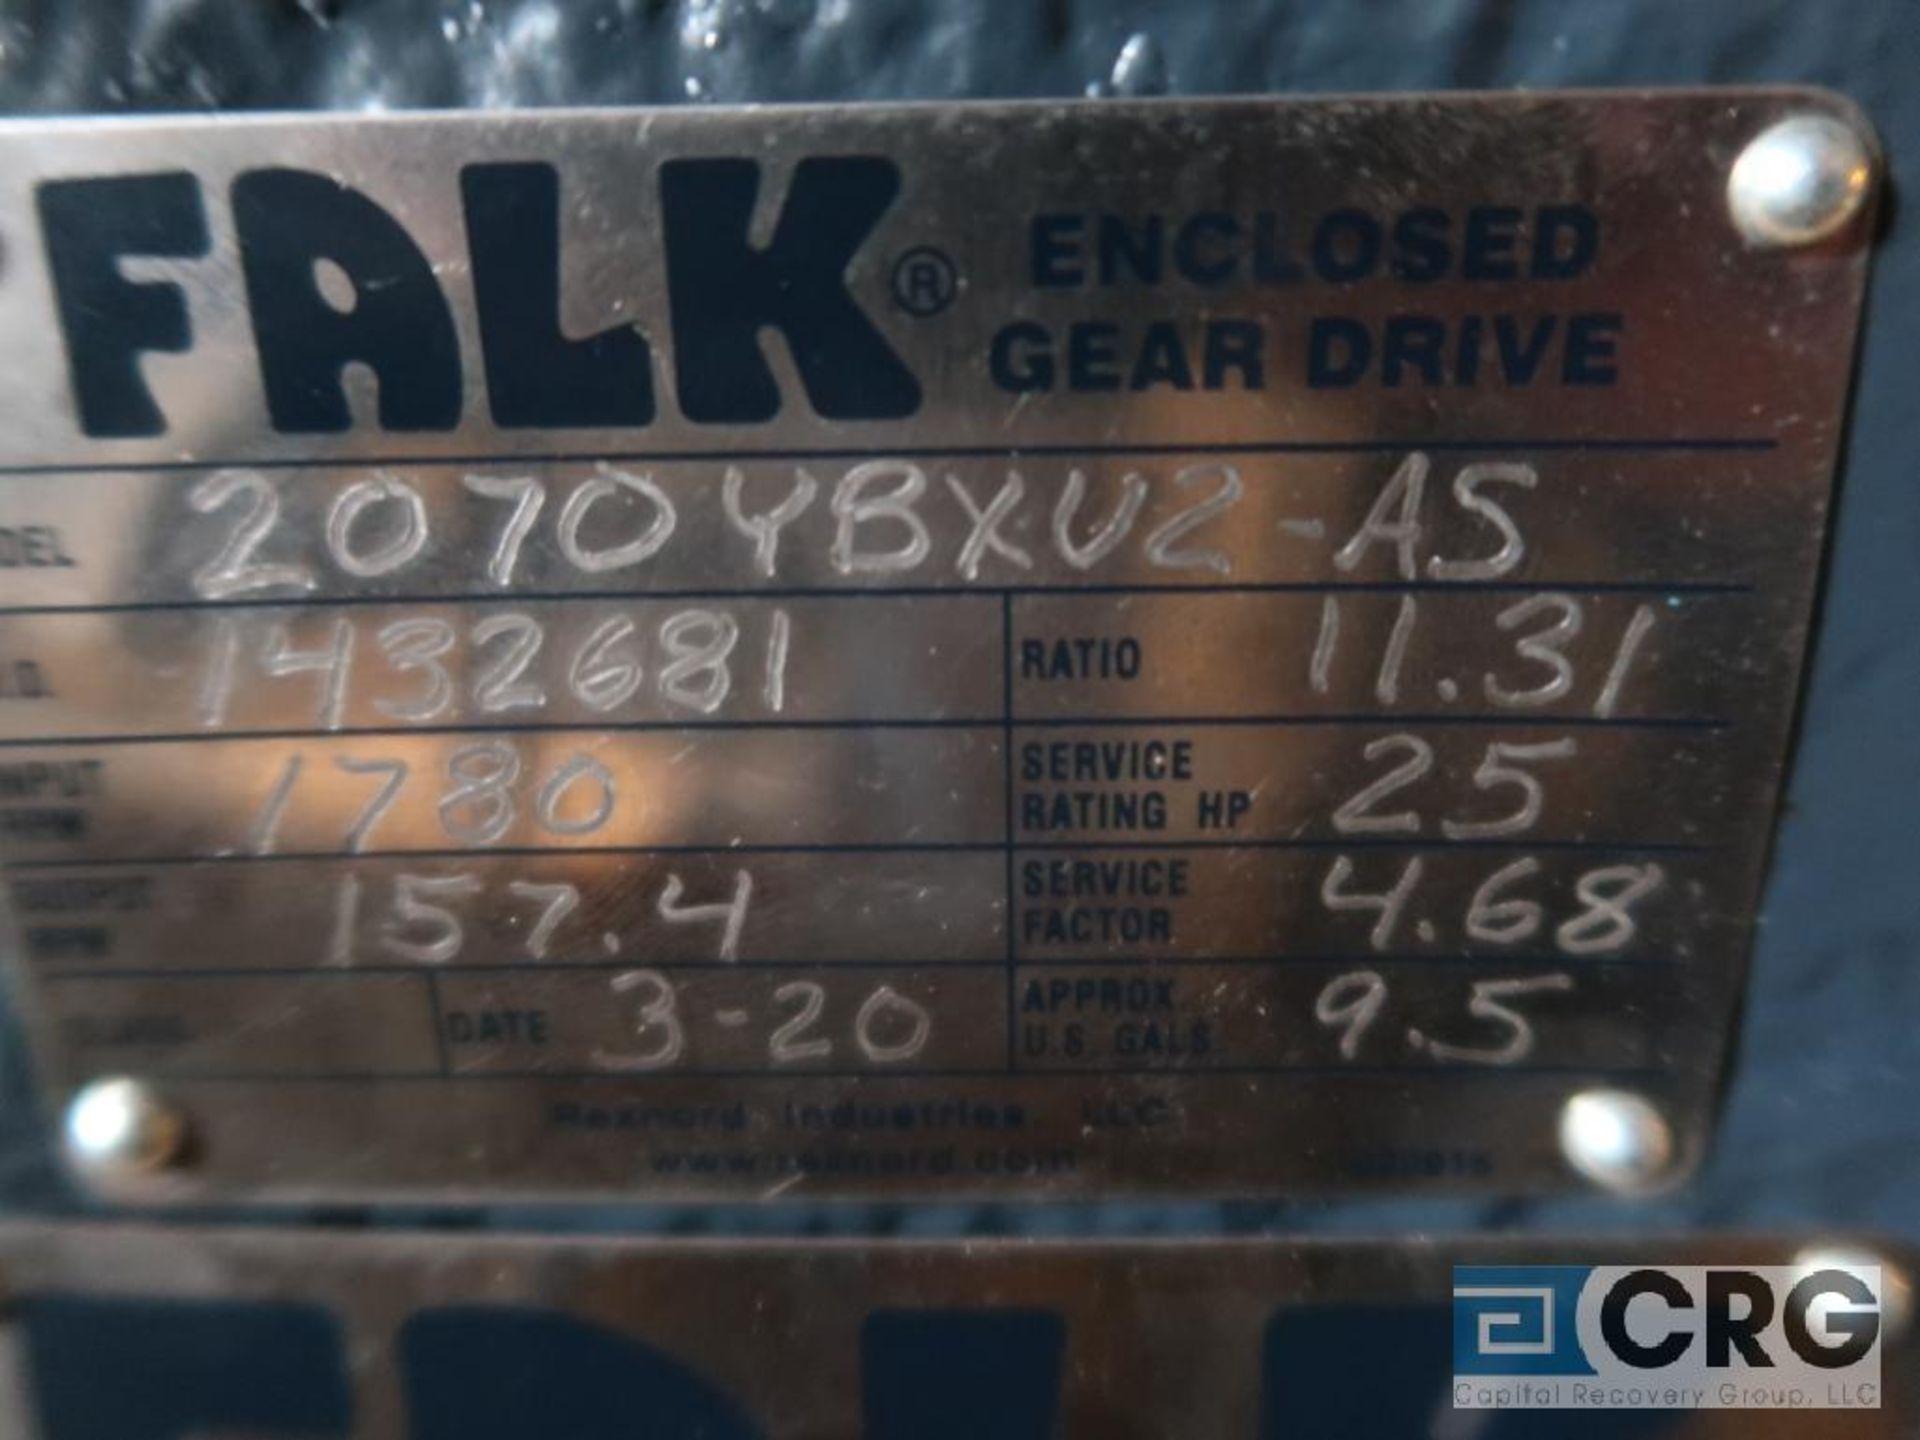 Falk 2070 YBXU2AS gear drive, ratio-11.31, input RPM 1,780, output RPM 157.4, service rate HP. 25, - Image 2 of 2